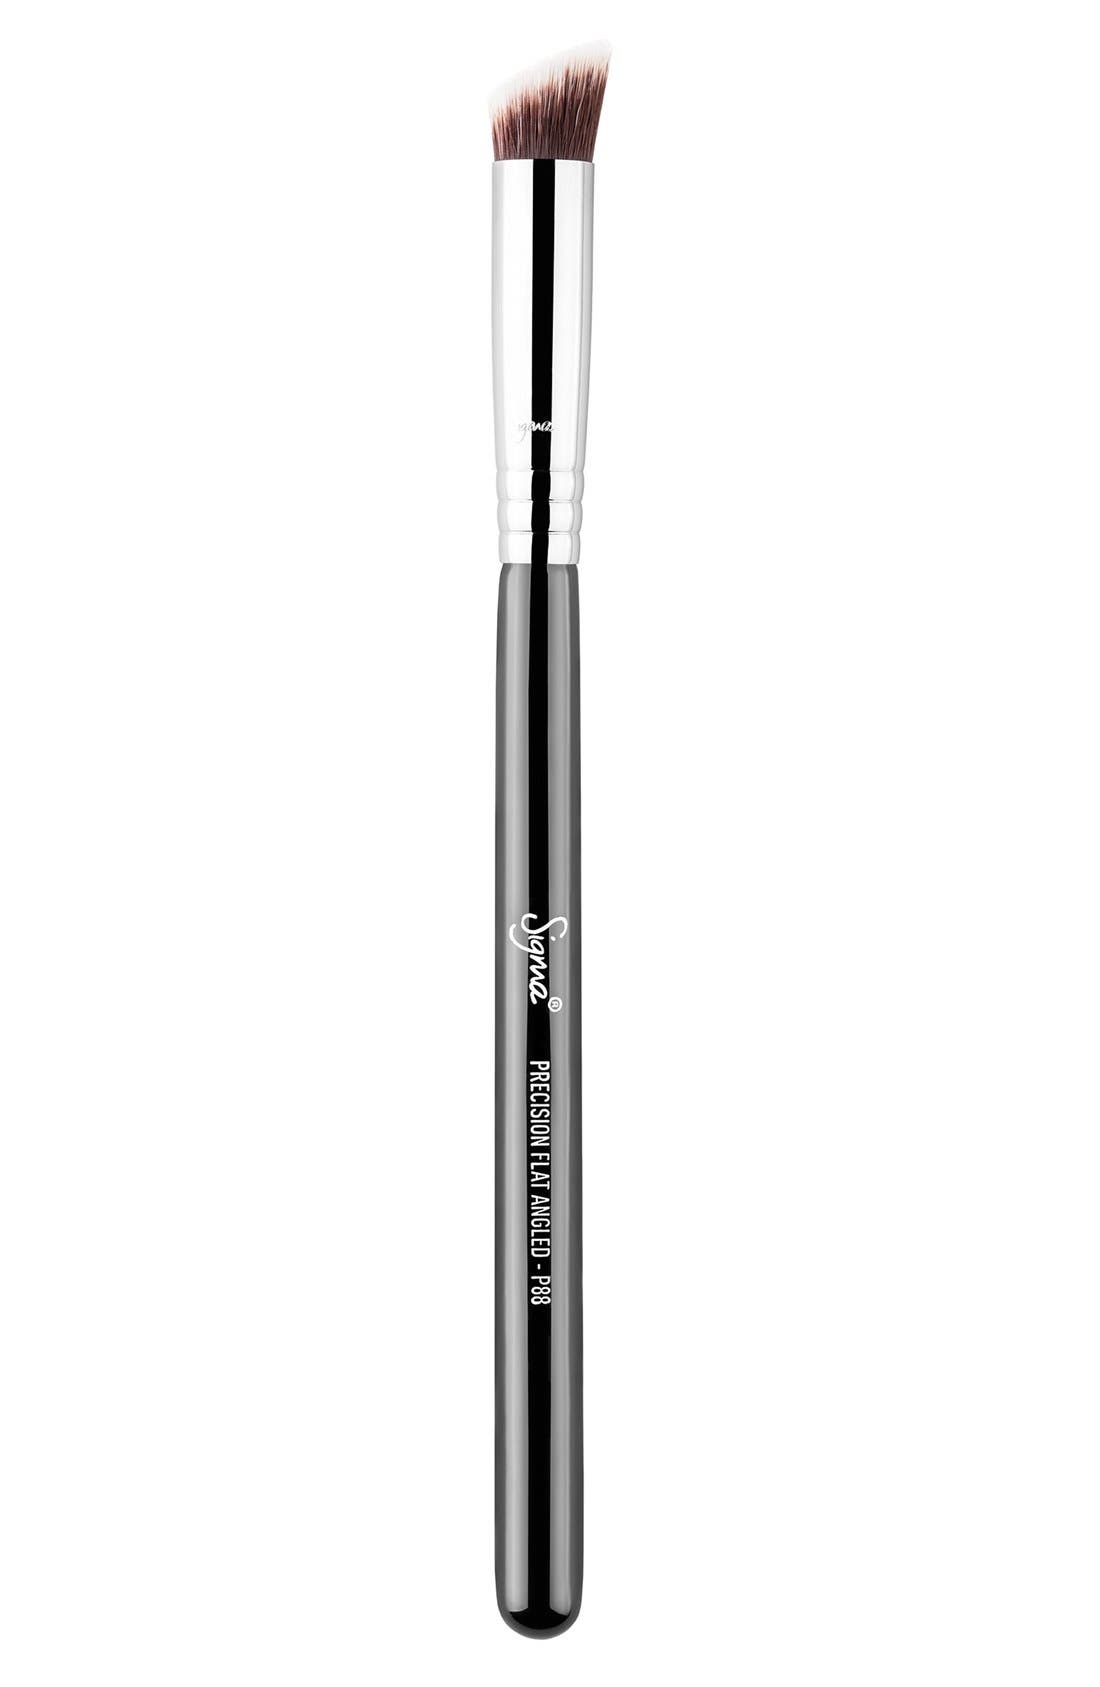 P88 Precision Flat Angled<sup>™</sup> Brush,                             Main thumbnail 1, color,                             NO COLOR